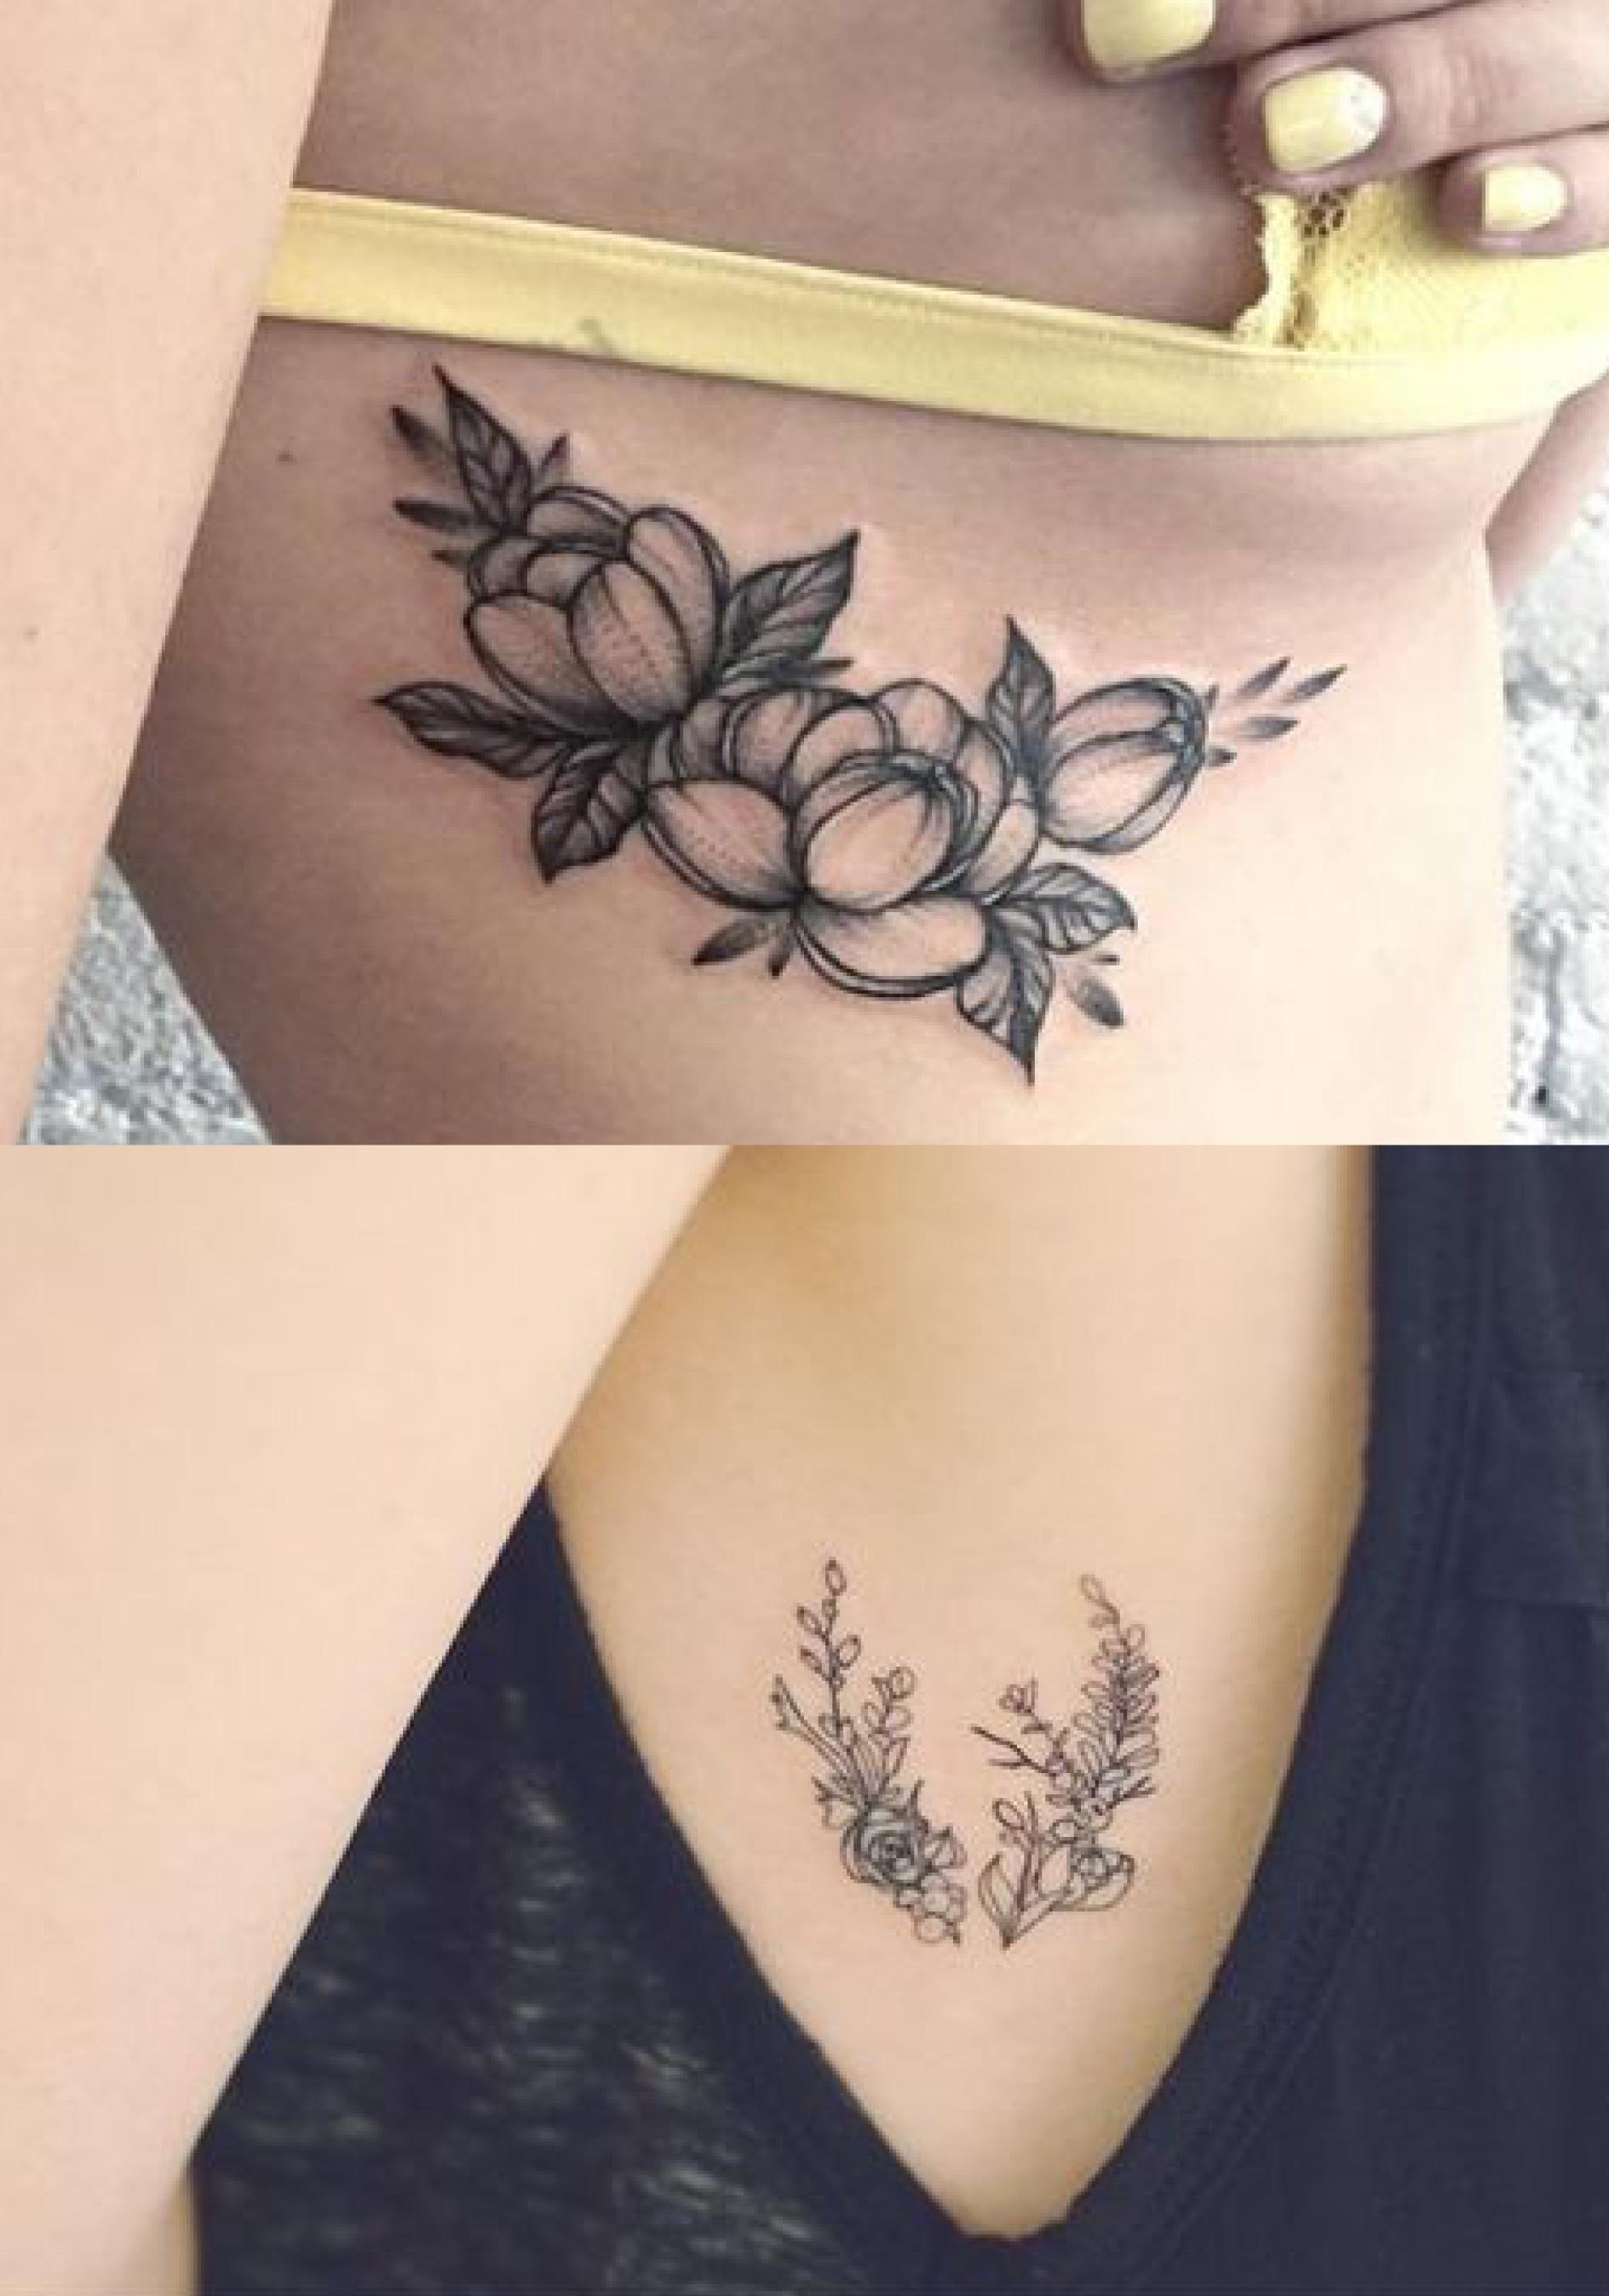 Tatouage cot du ventre galerie tatouage - Tatouage sur les cotes ...